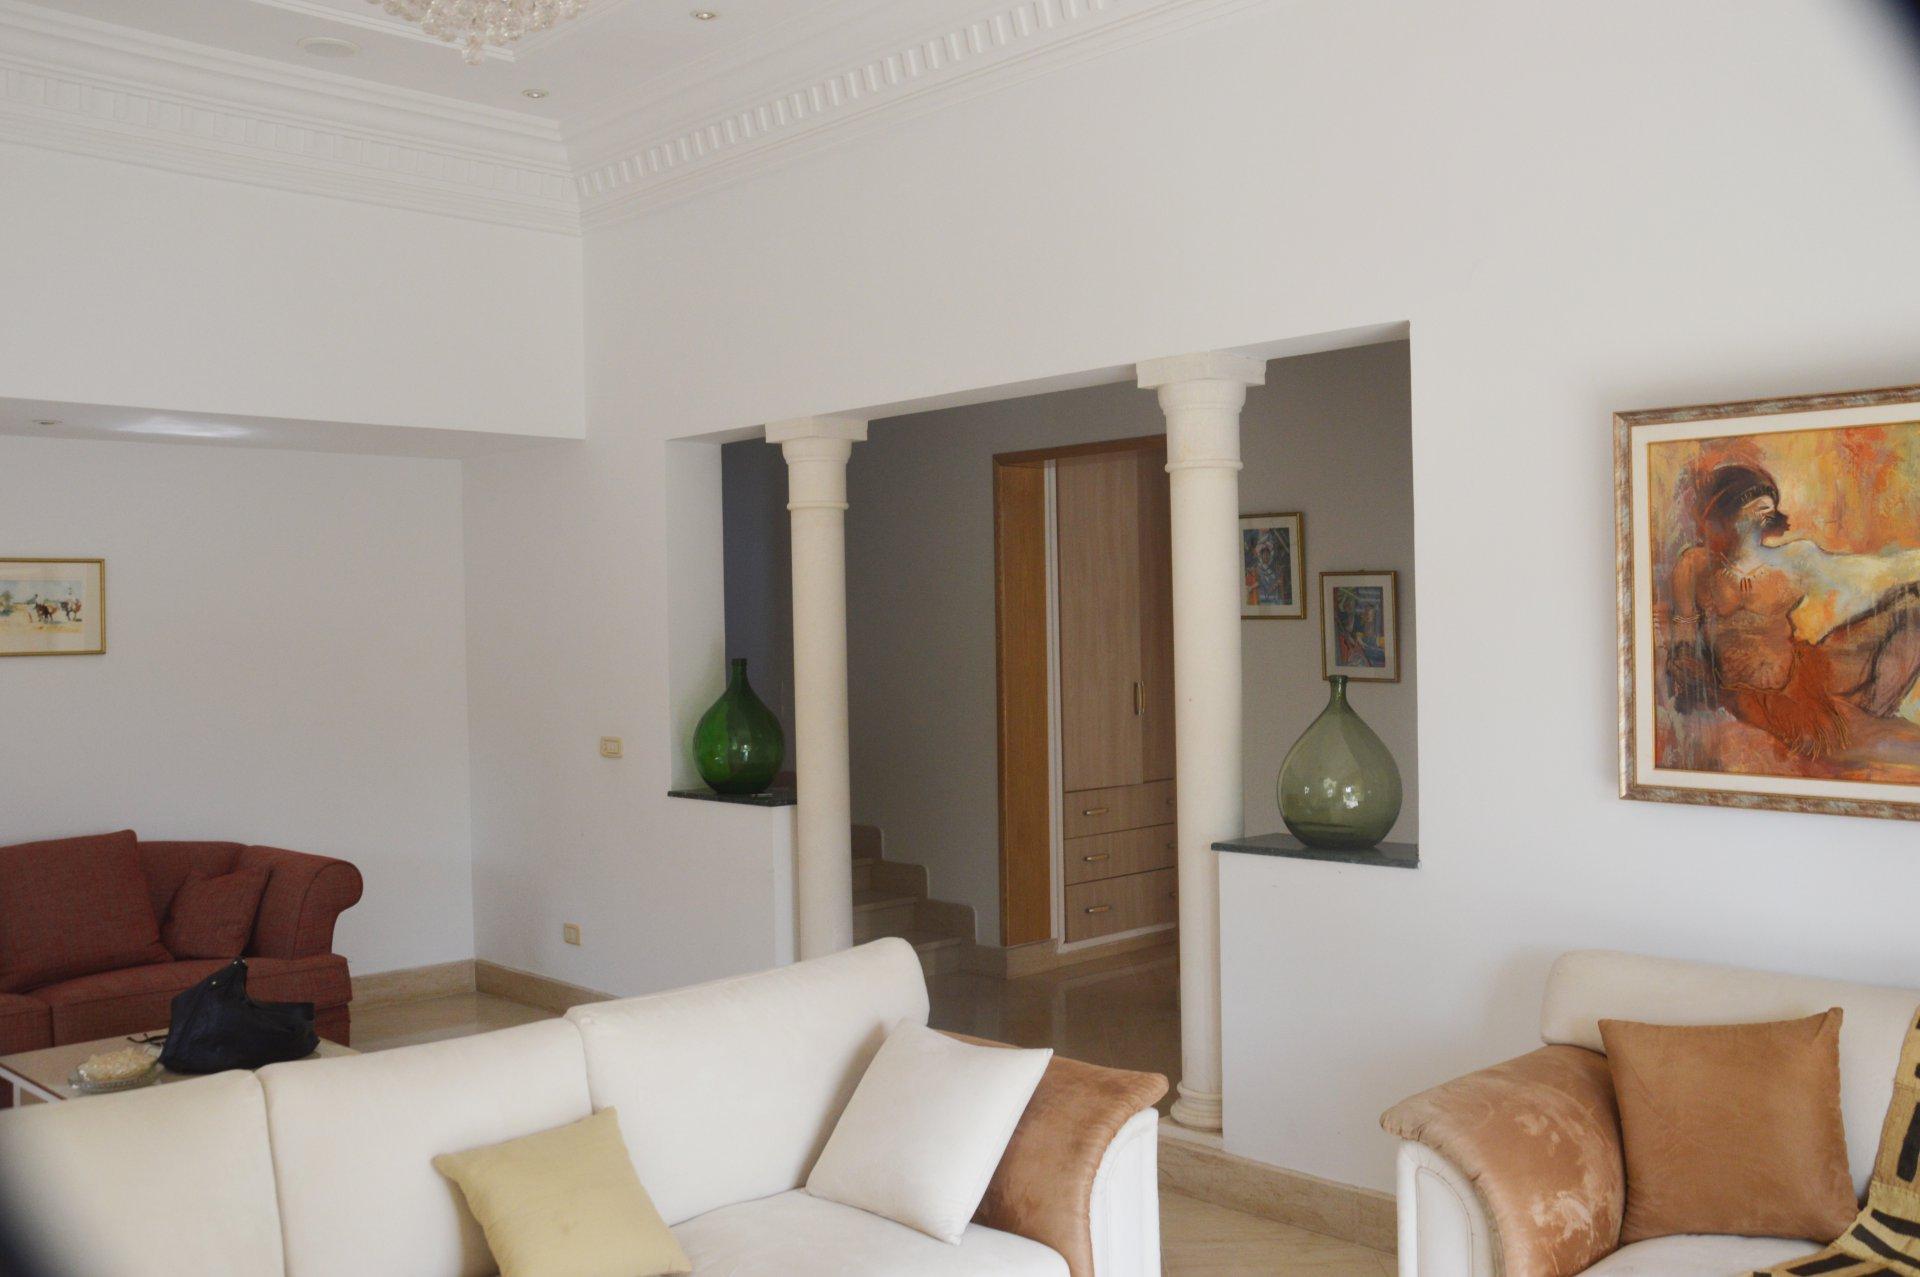 A vendre une villa de 620 m² à Gammarth Supérieur